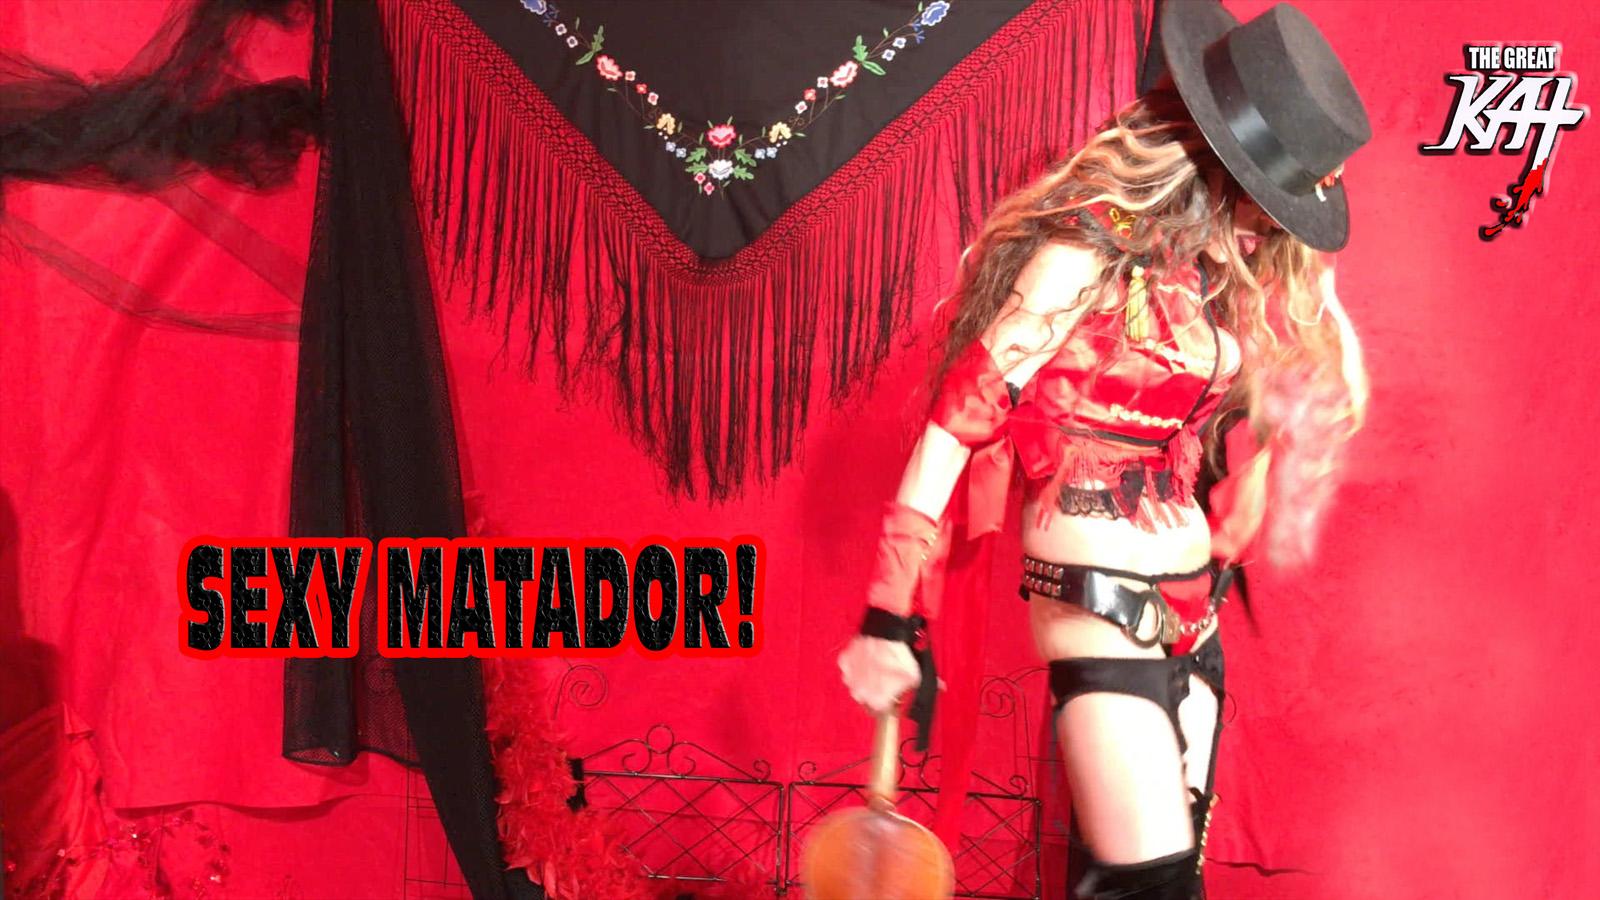 "SEXY MATADOR!! From The Great Kat's SARASATE'S ""CARMEN FANTASY"" MUSIC VIDEO!"